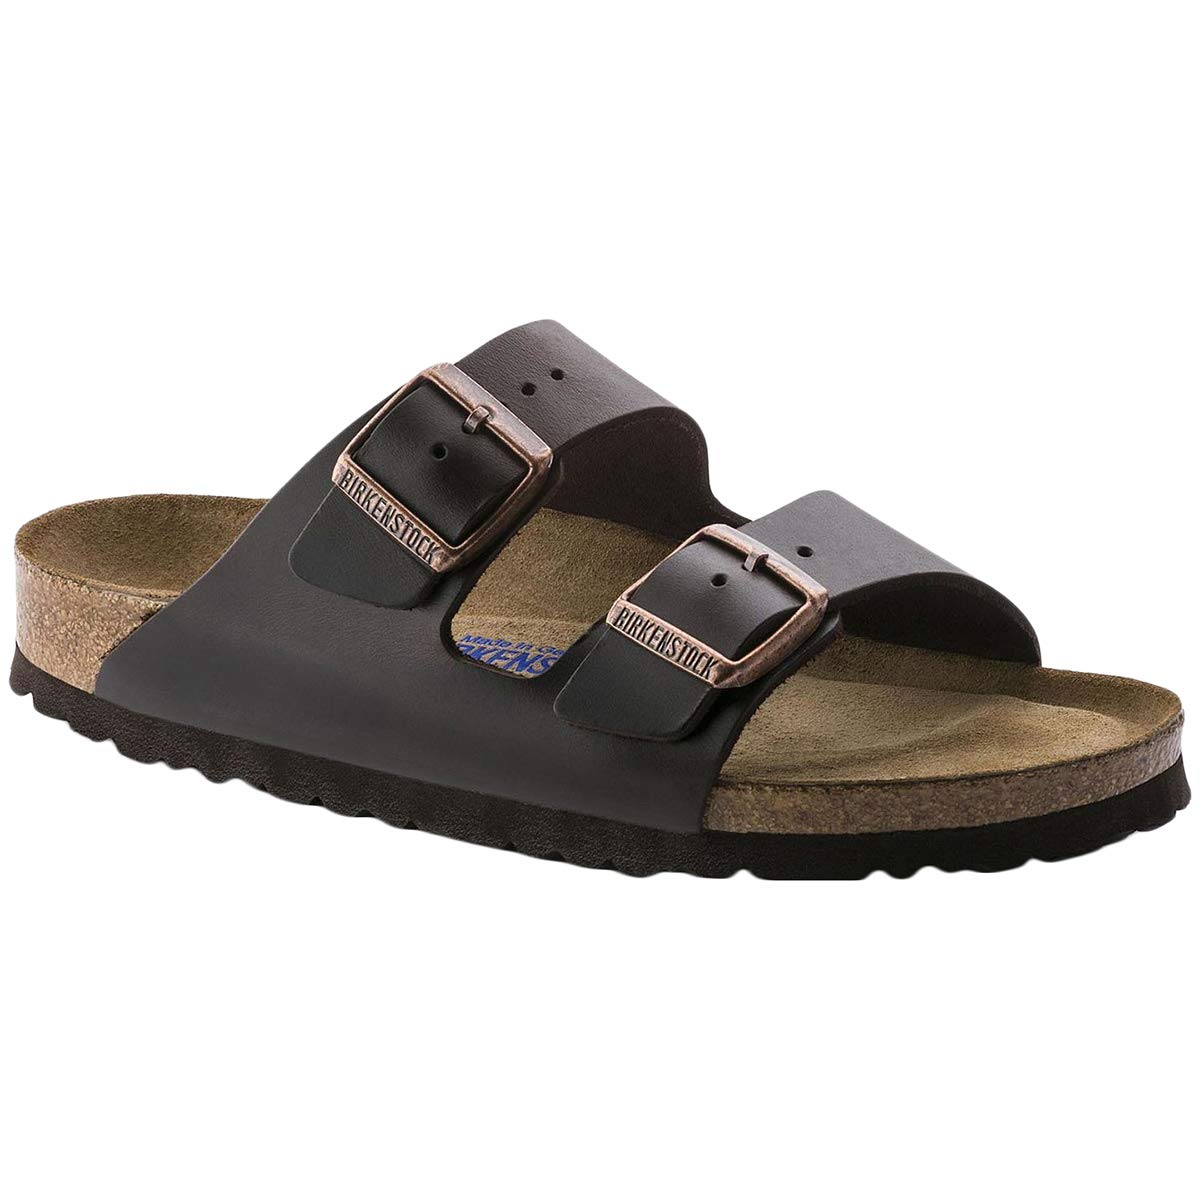 Birkenstock Womens Arizona Soft Footbed Leather Amalfi Testa Di Moro Sandals 8 US